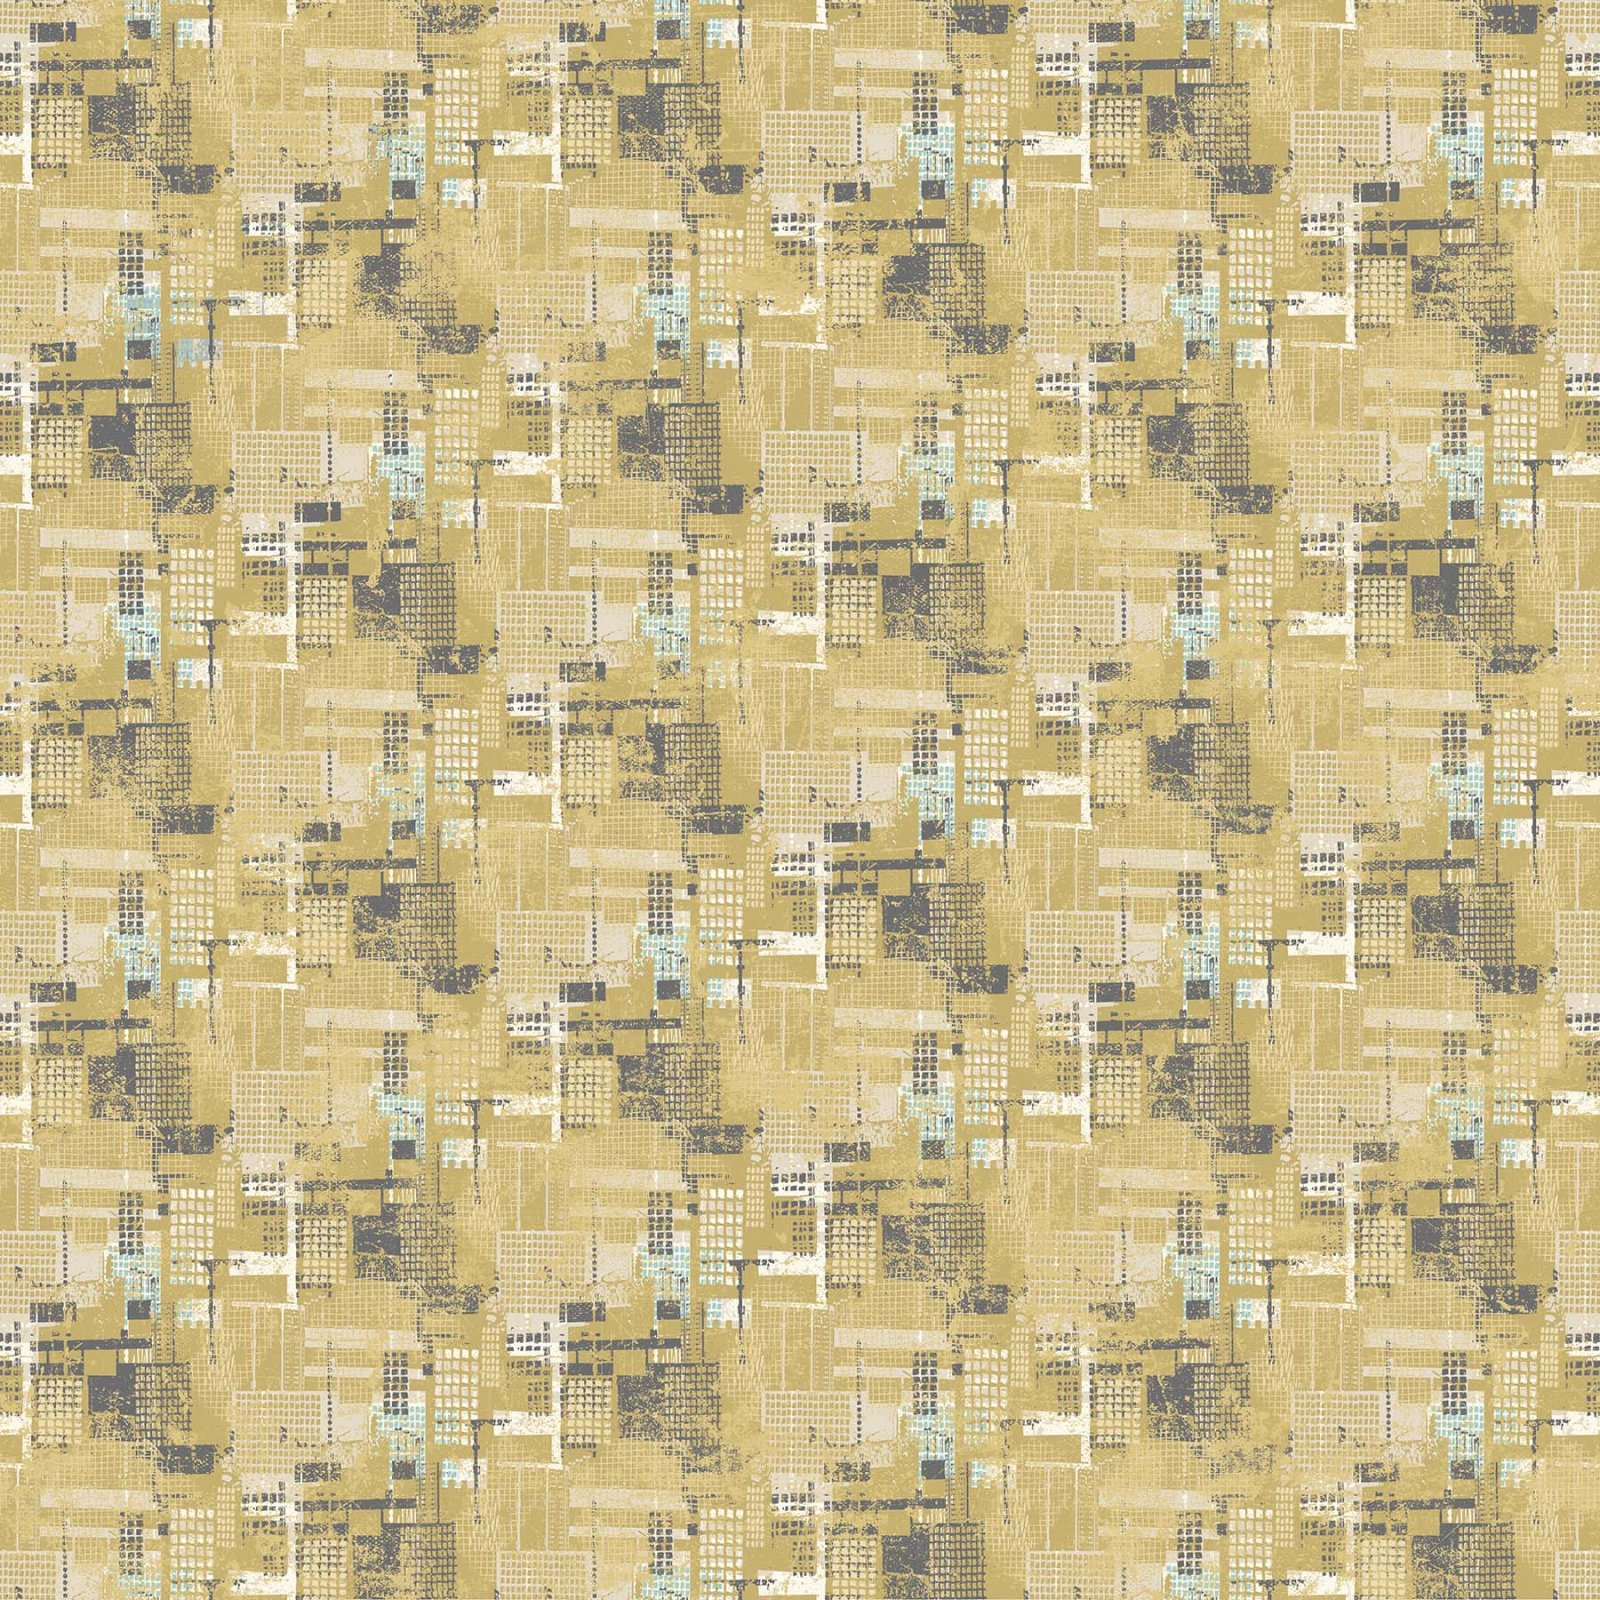 Urban Grunge 22675 (color 54)